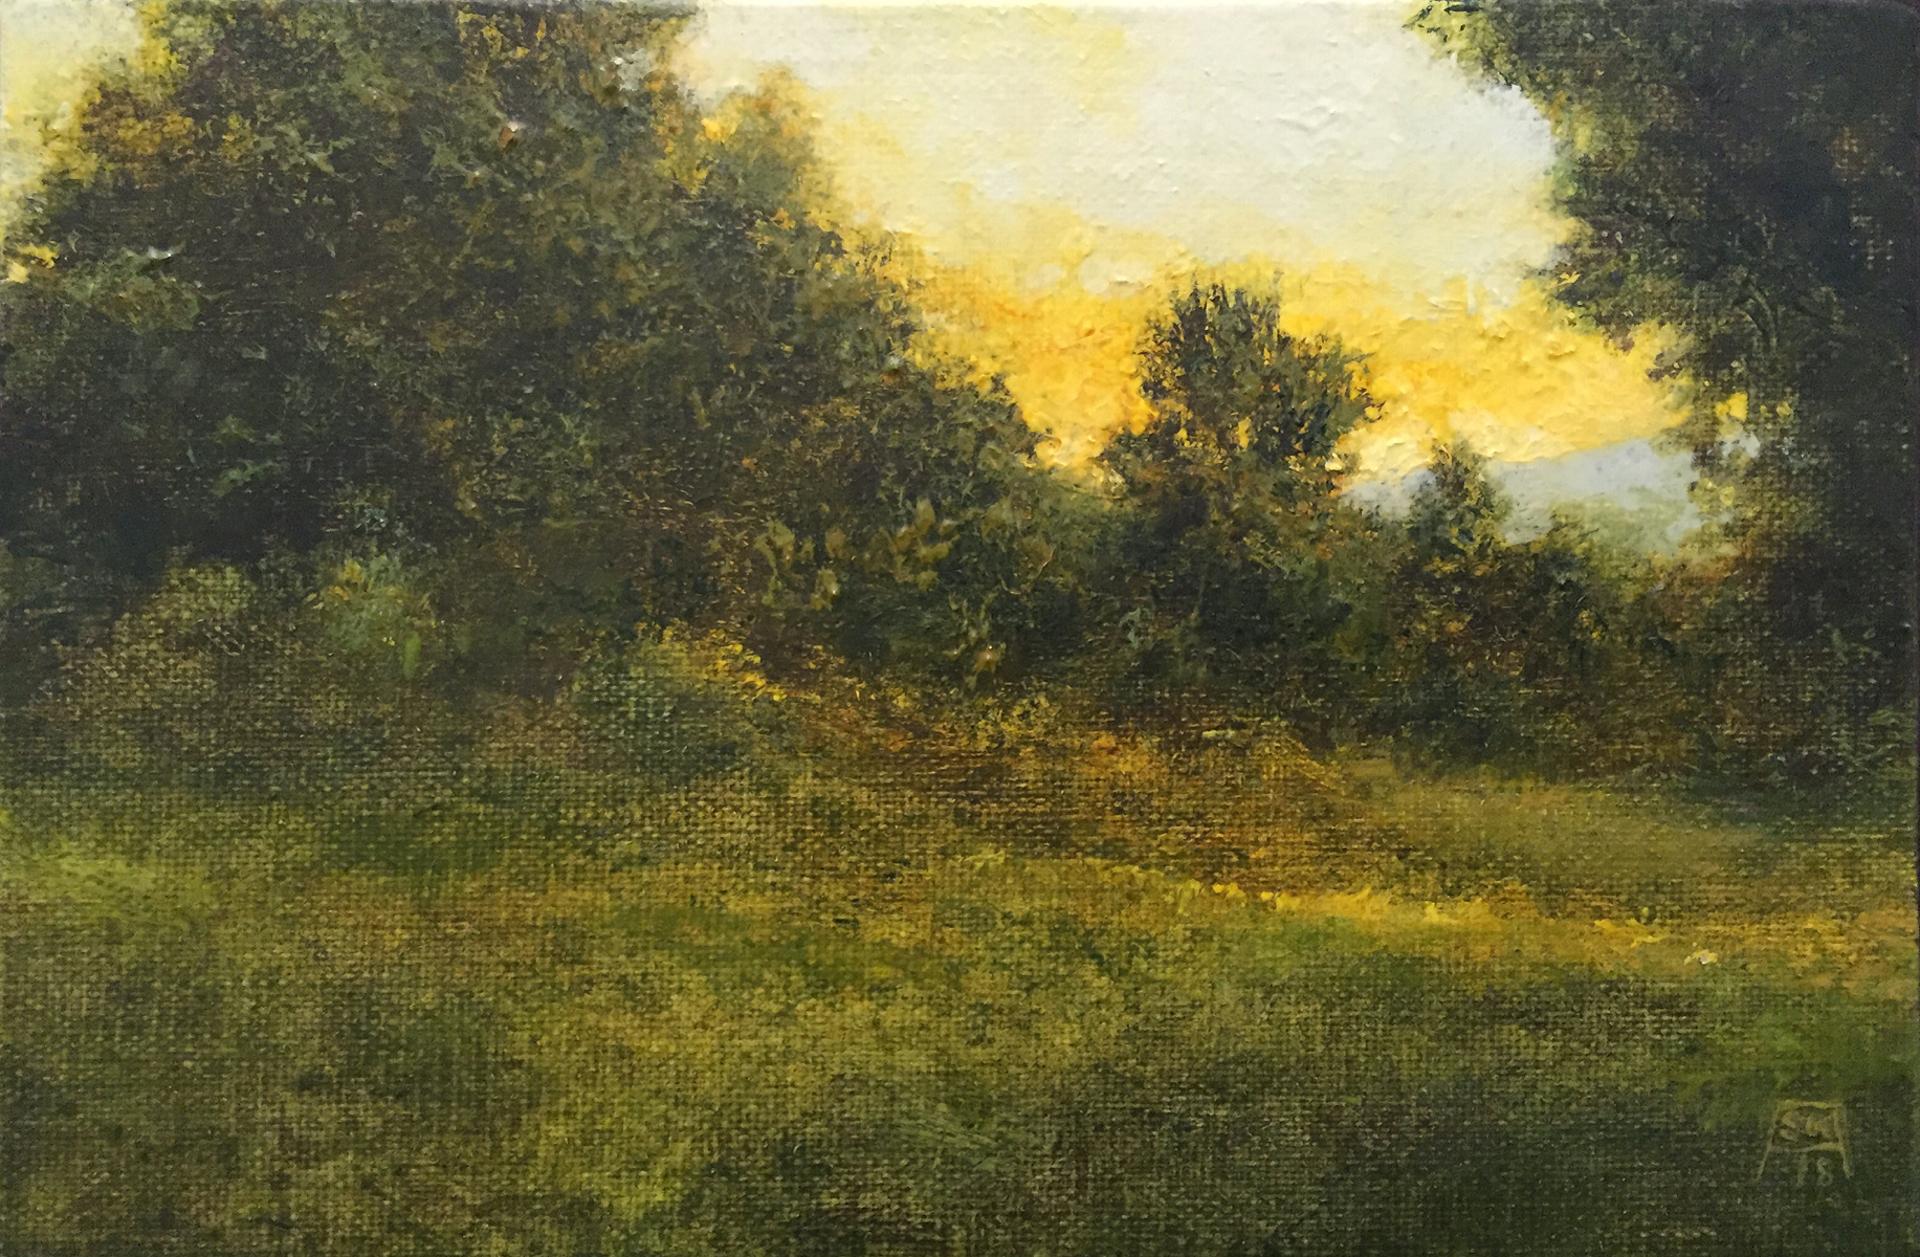 Morning (Somewhere) by Shawn Krueger